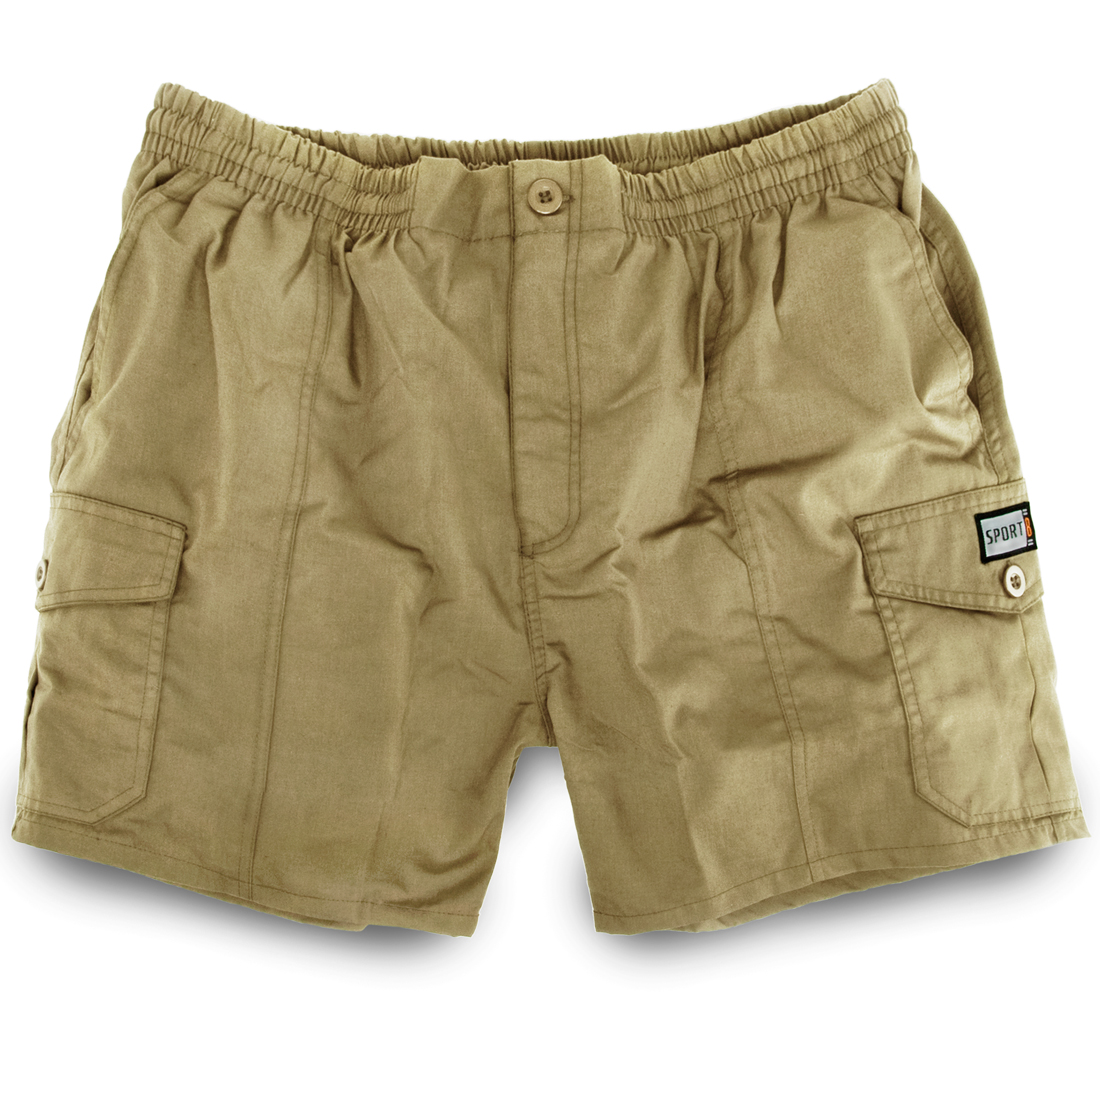 herren shorts cargo shorts kurze hose elastischer bund sommer bermuda. Black Bedroom Furniture Sets. Home Design Ideas